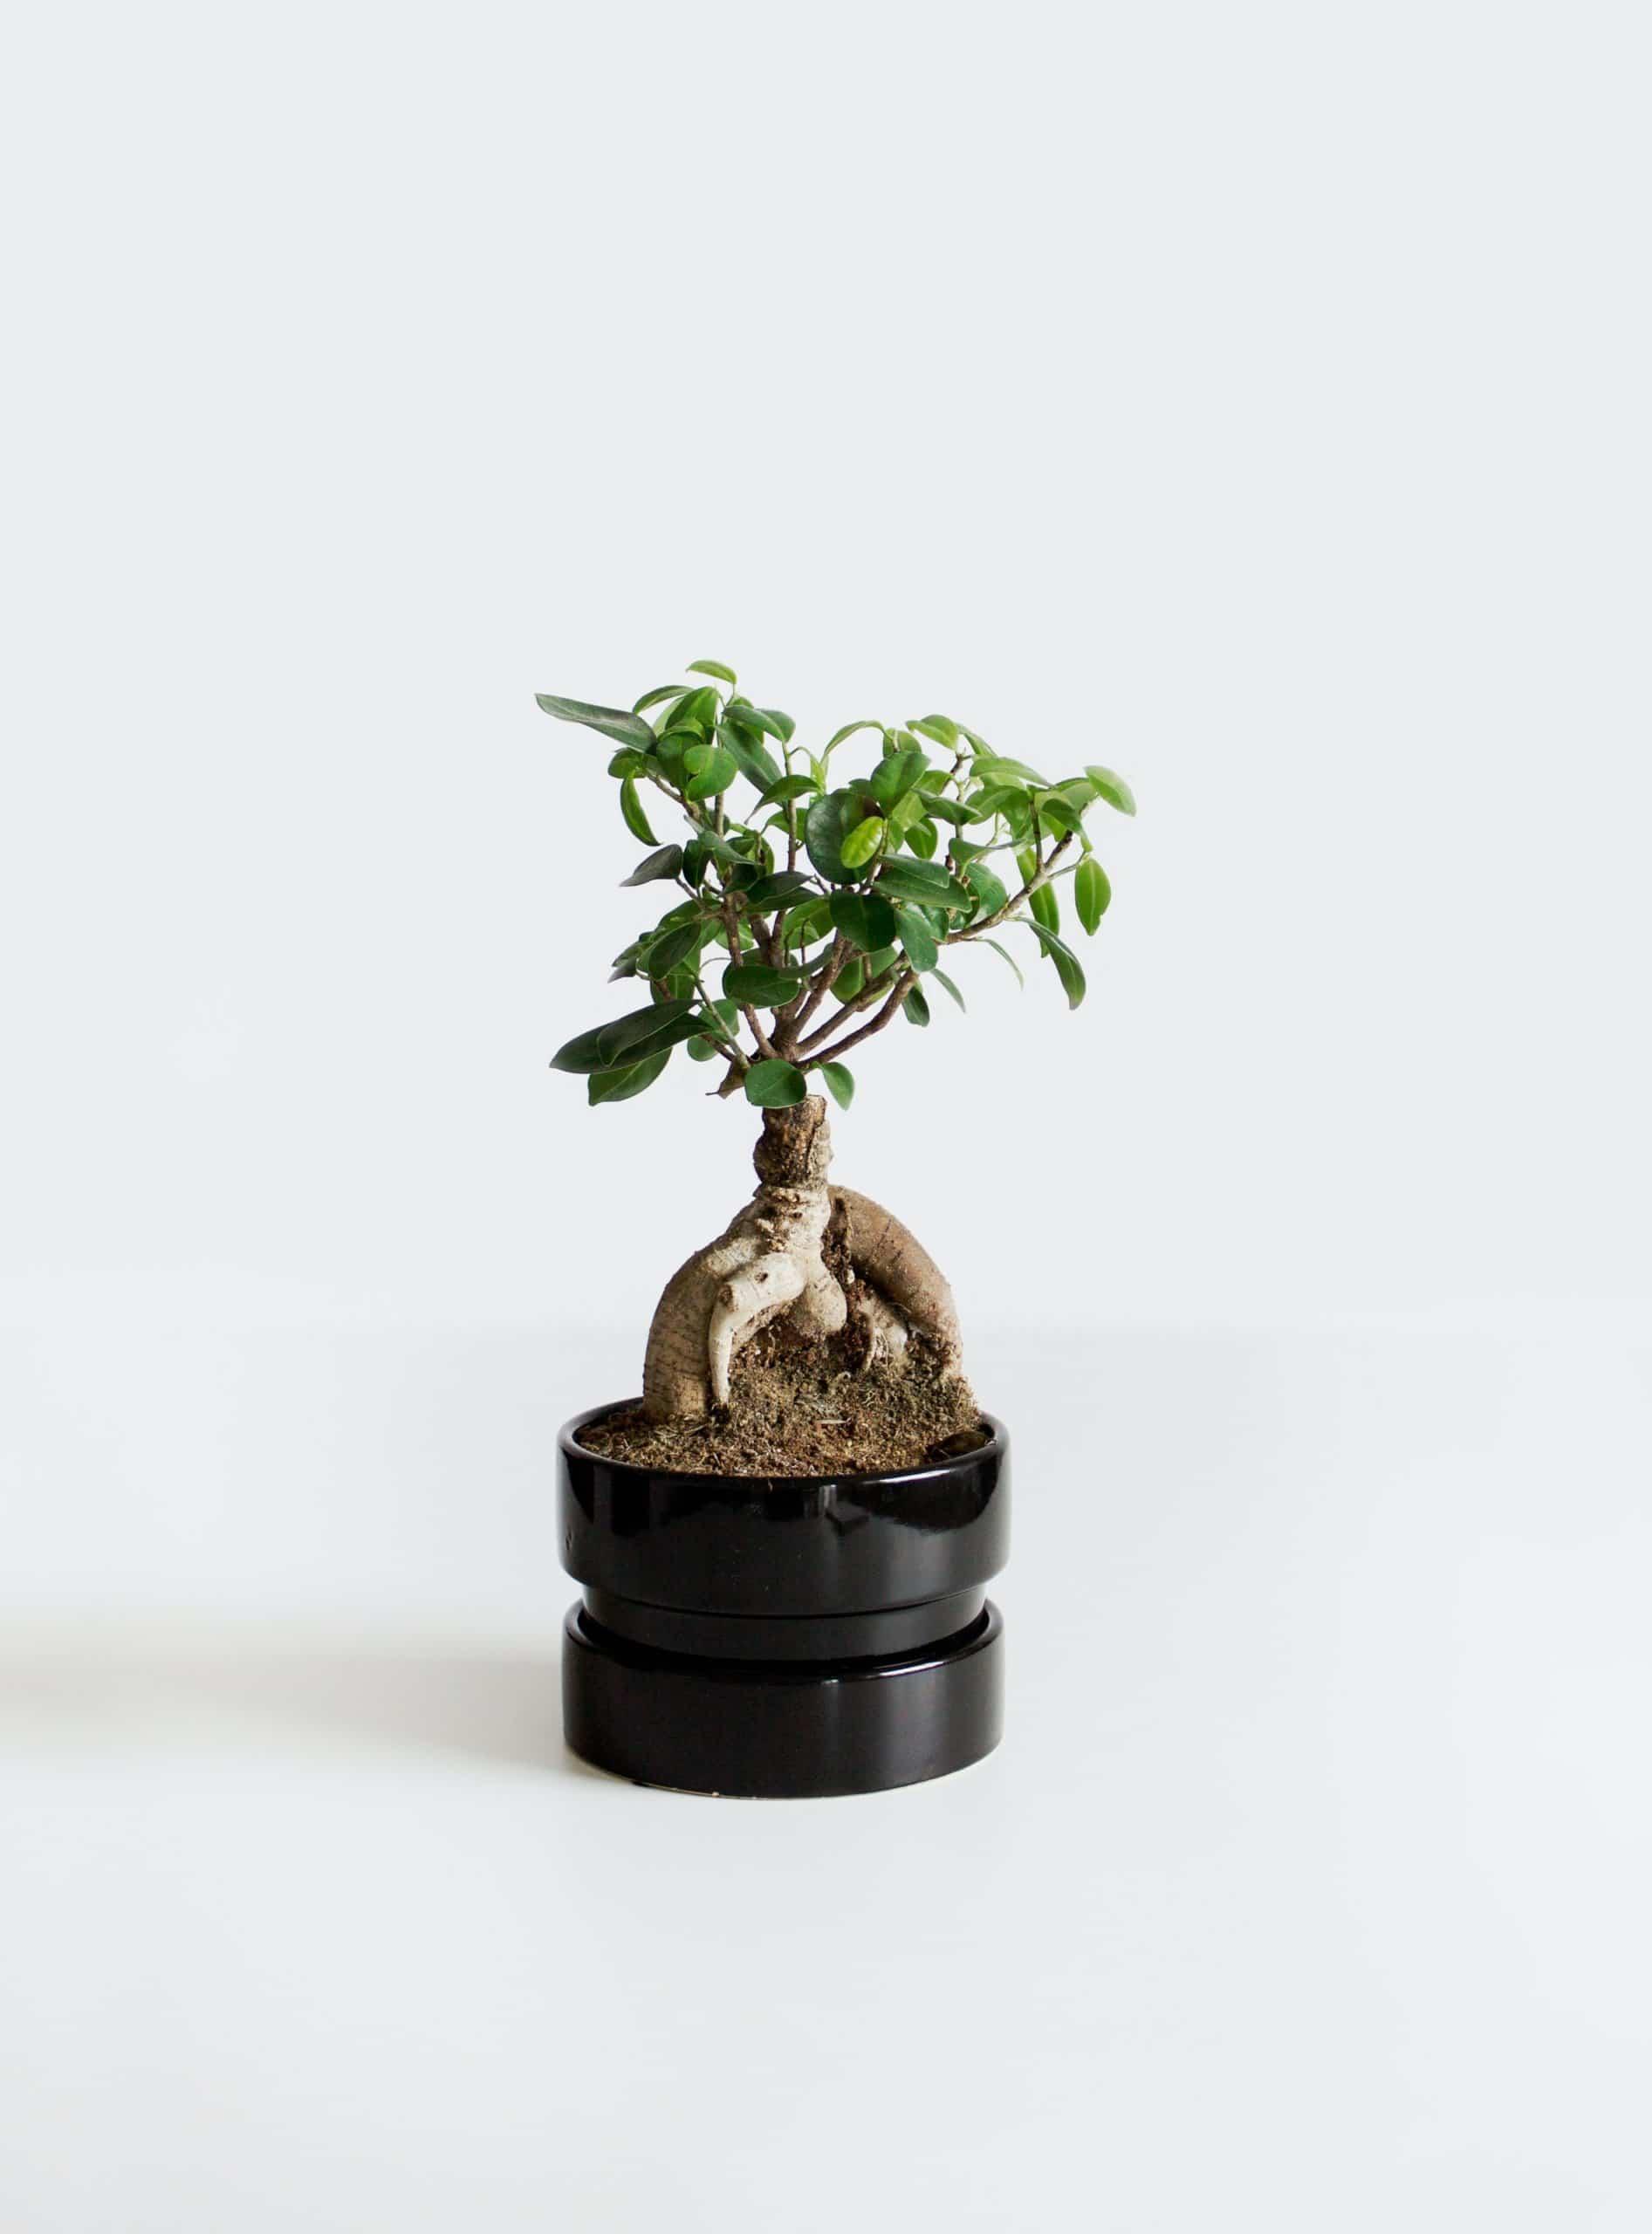 Bonsai Investment